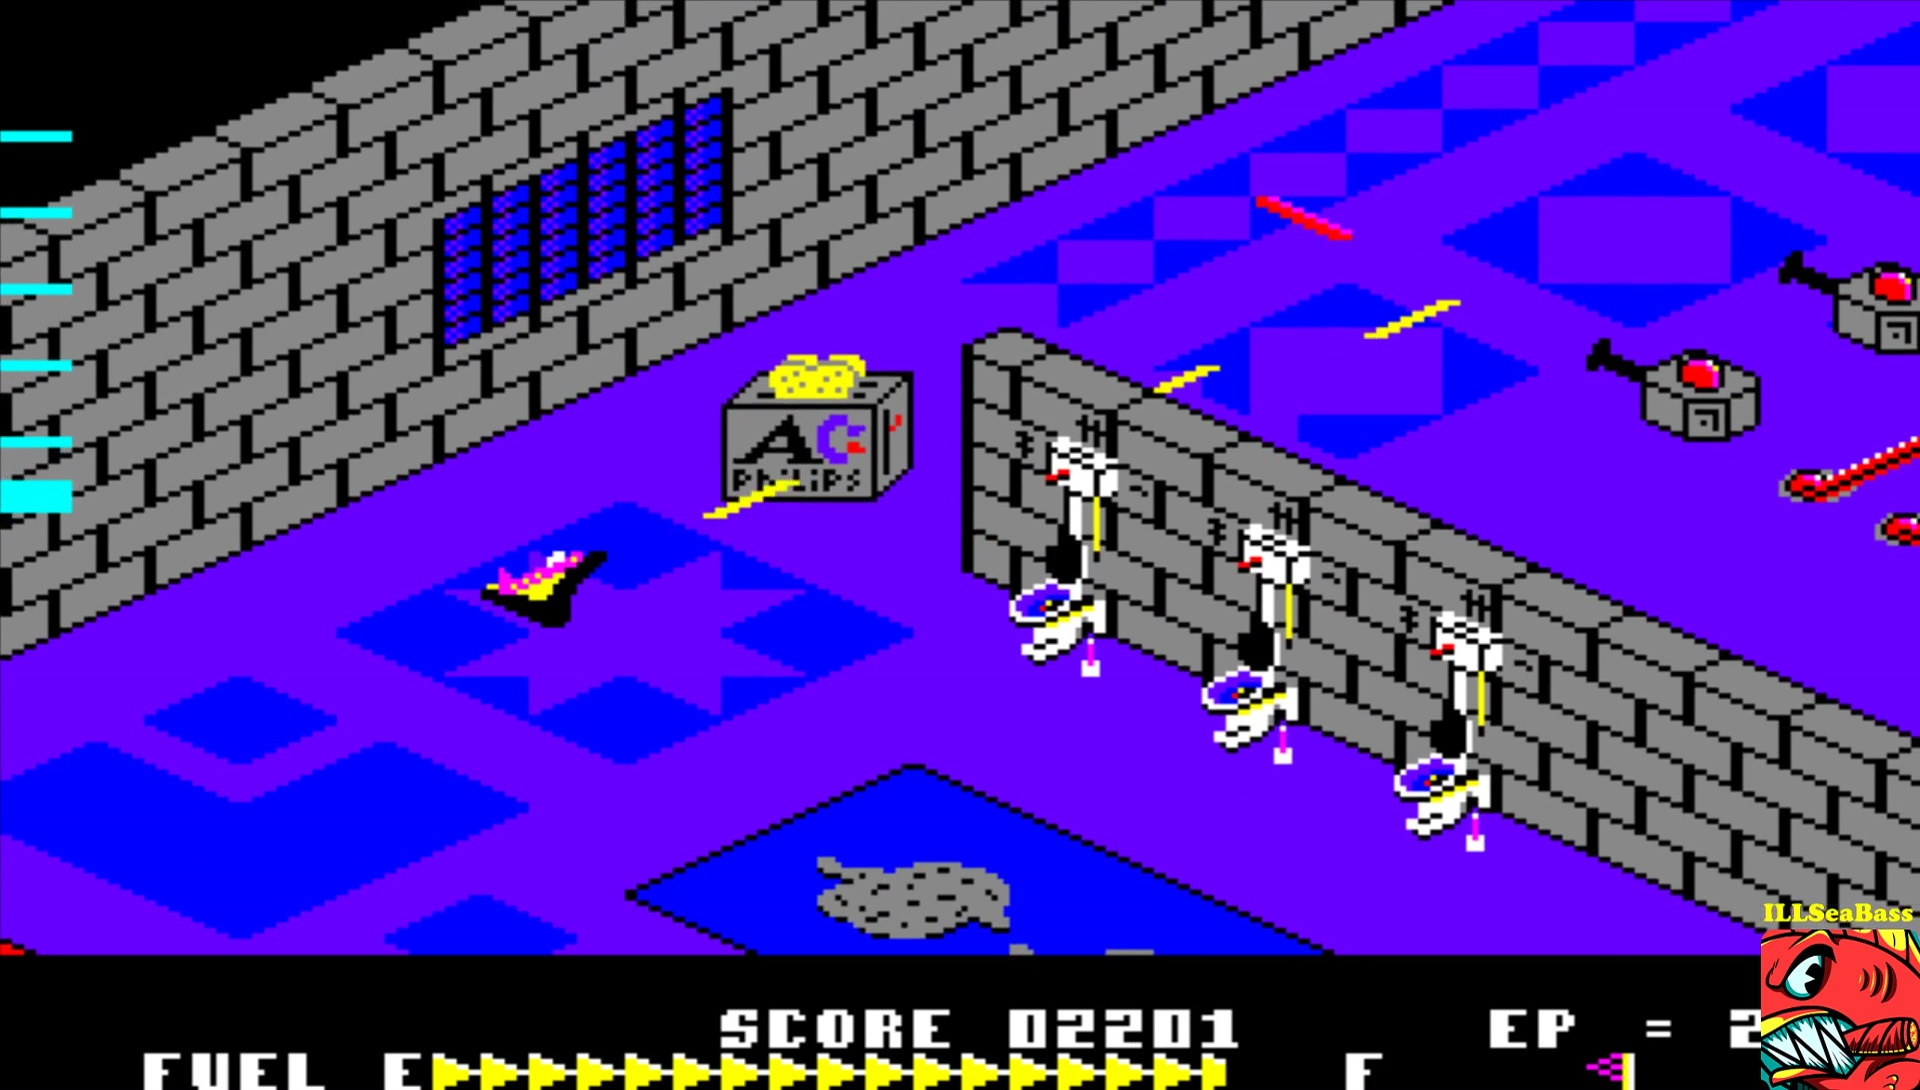 ILLSeaBass: Zaxxon [Bignonia] (Amiga Emulated) 2,654 points on 2017-03-07 19:07:08